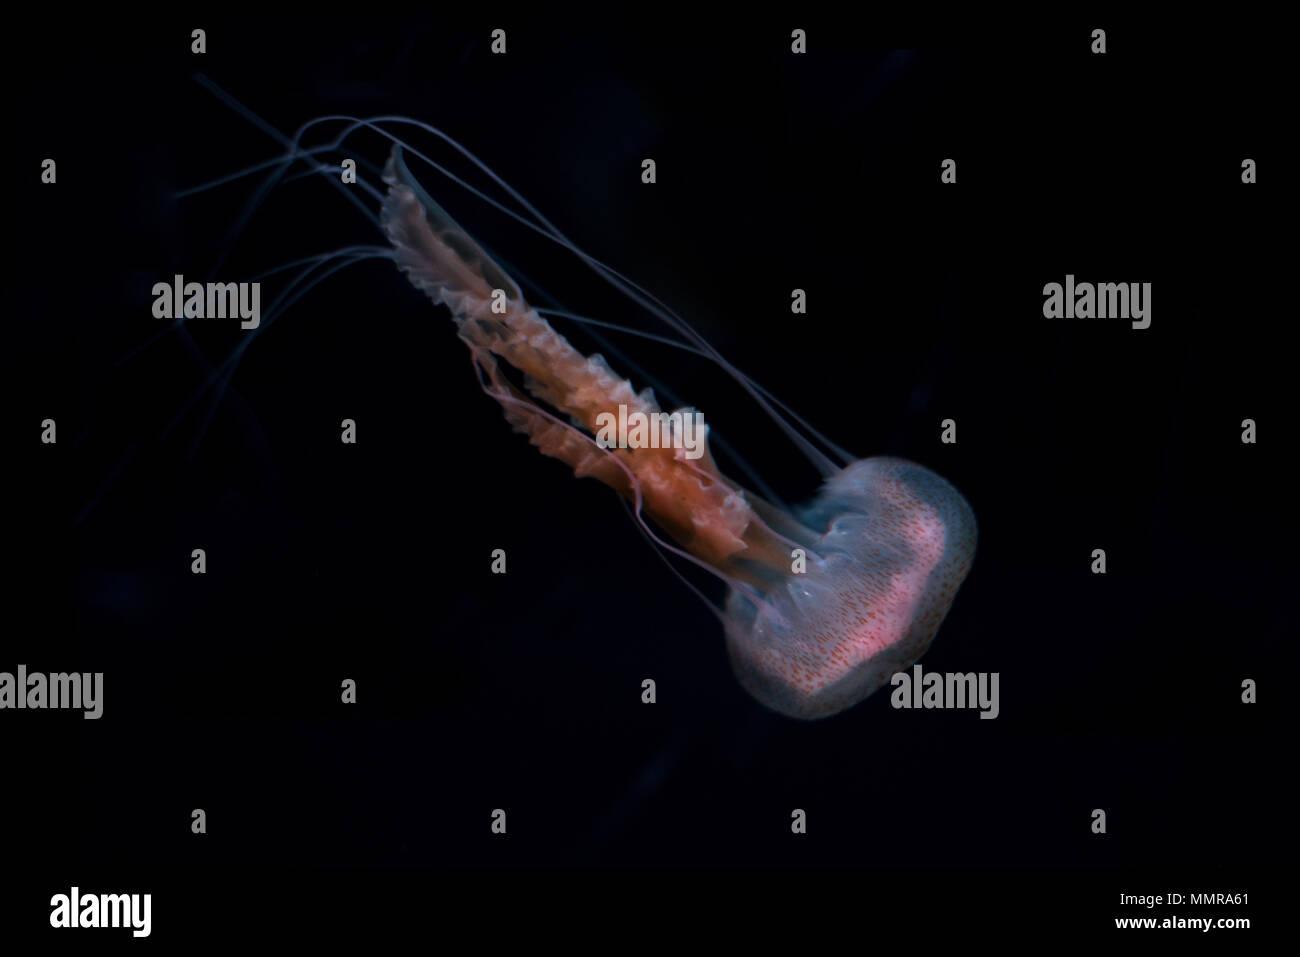 Jelly fish on black isolated background - Stock Image